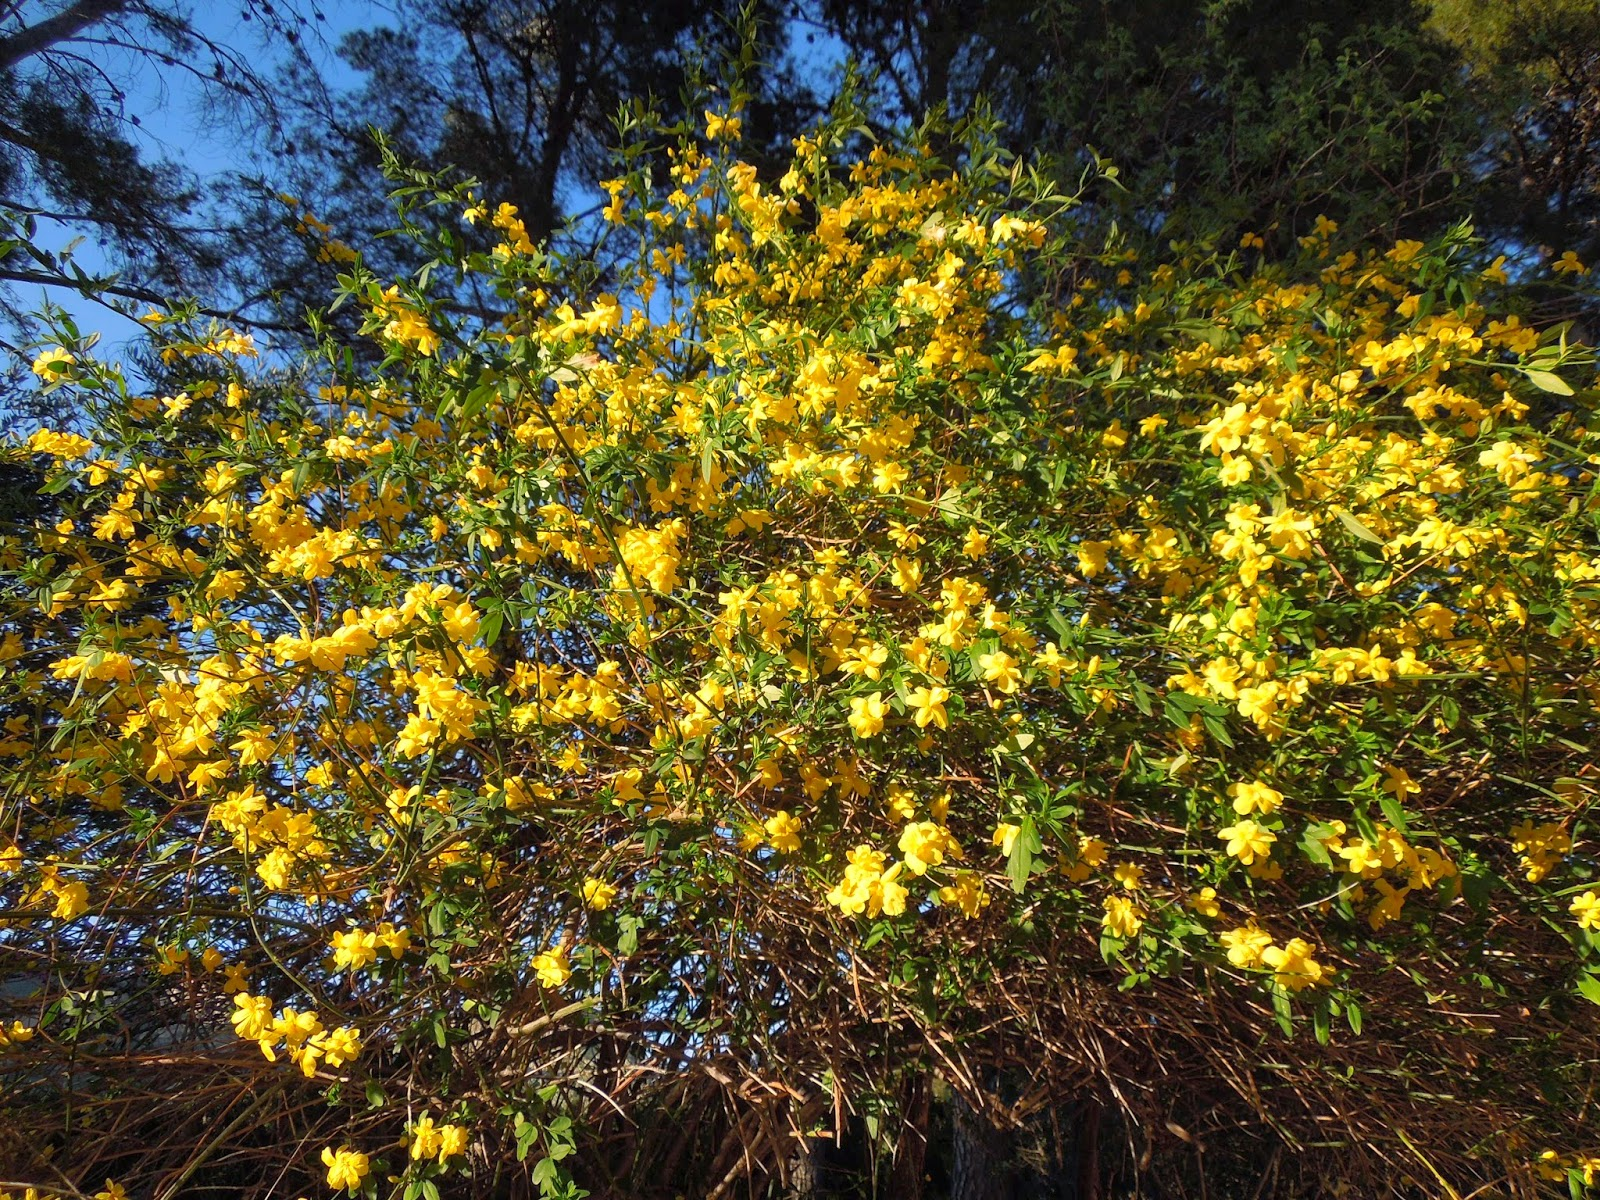 Marzo 2014 bot nic serrat - Arbusto pequeno con flores ...